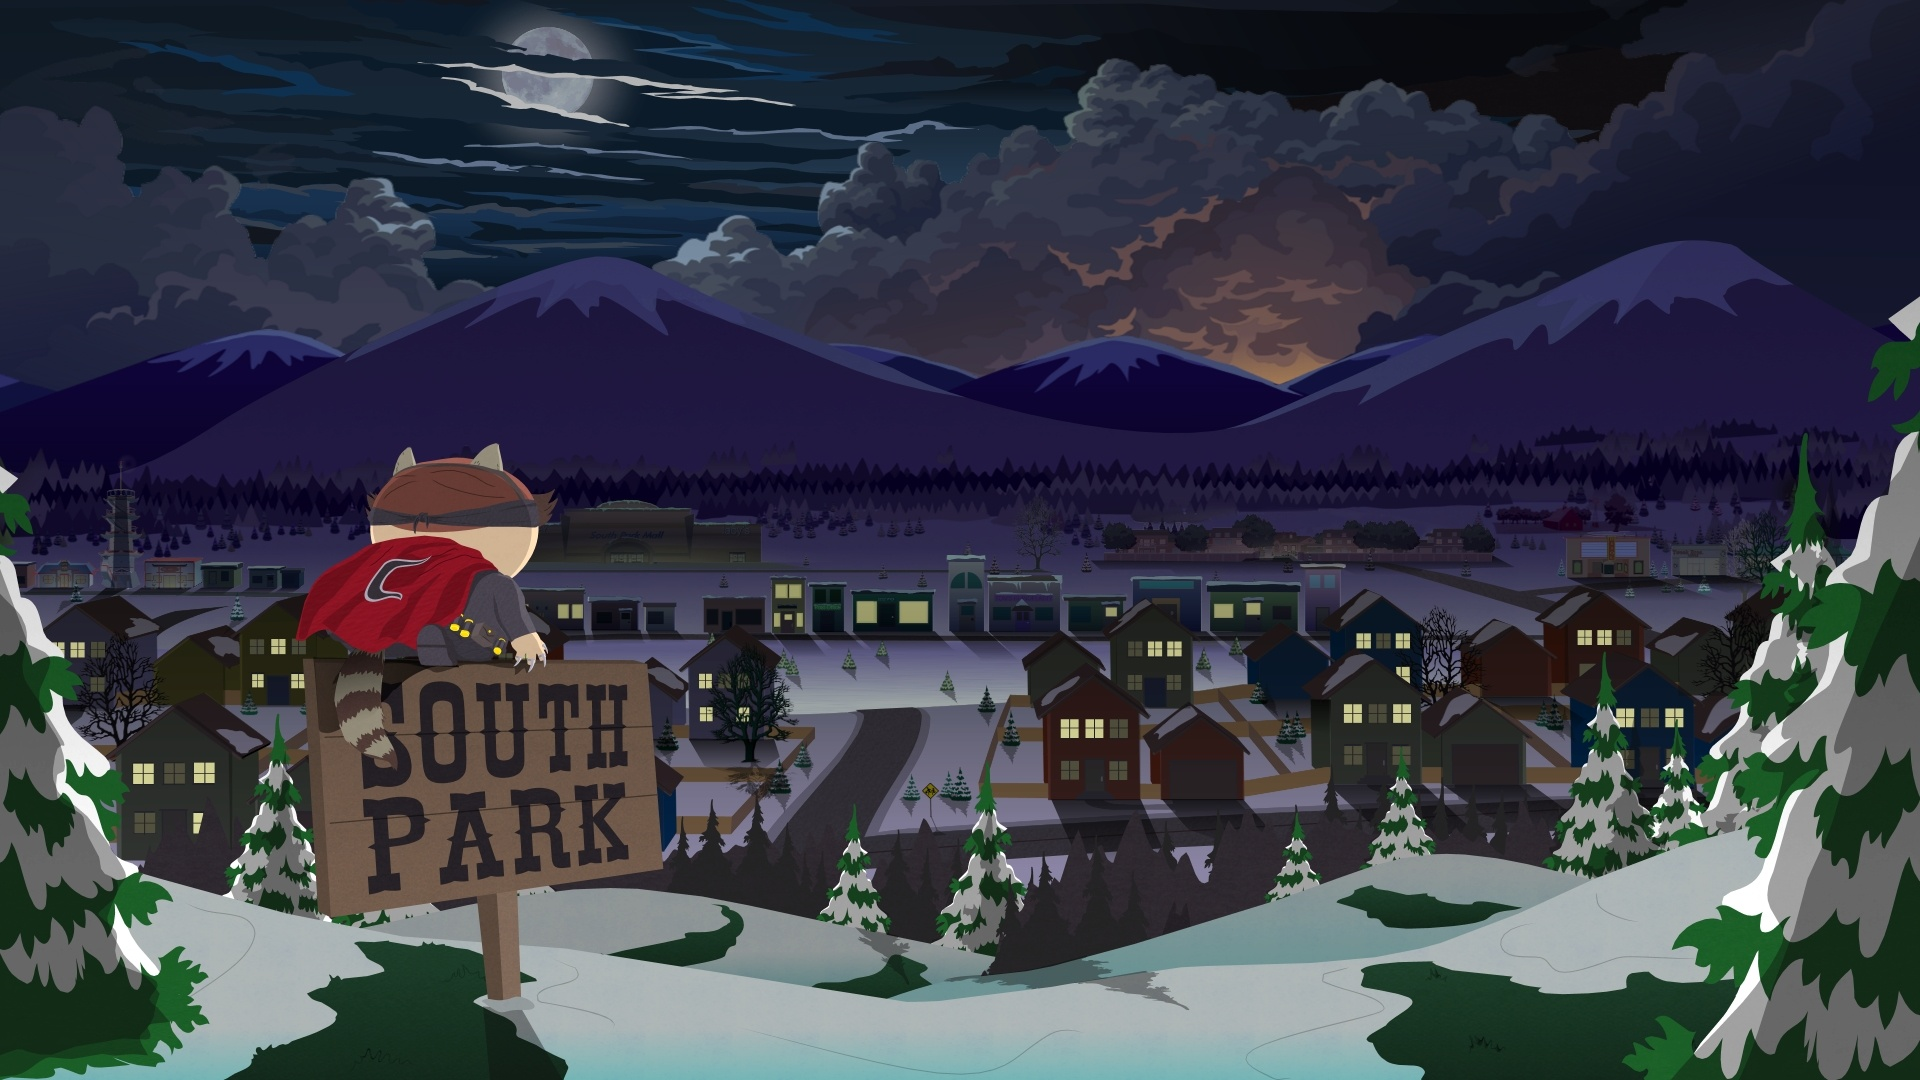 South Park desktop wallpaper